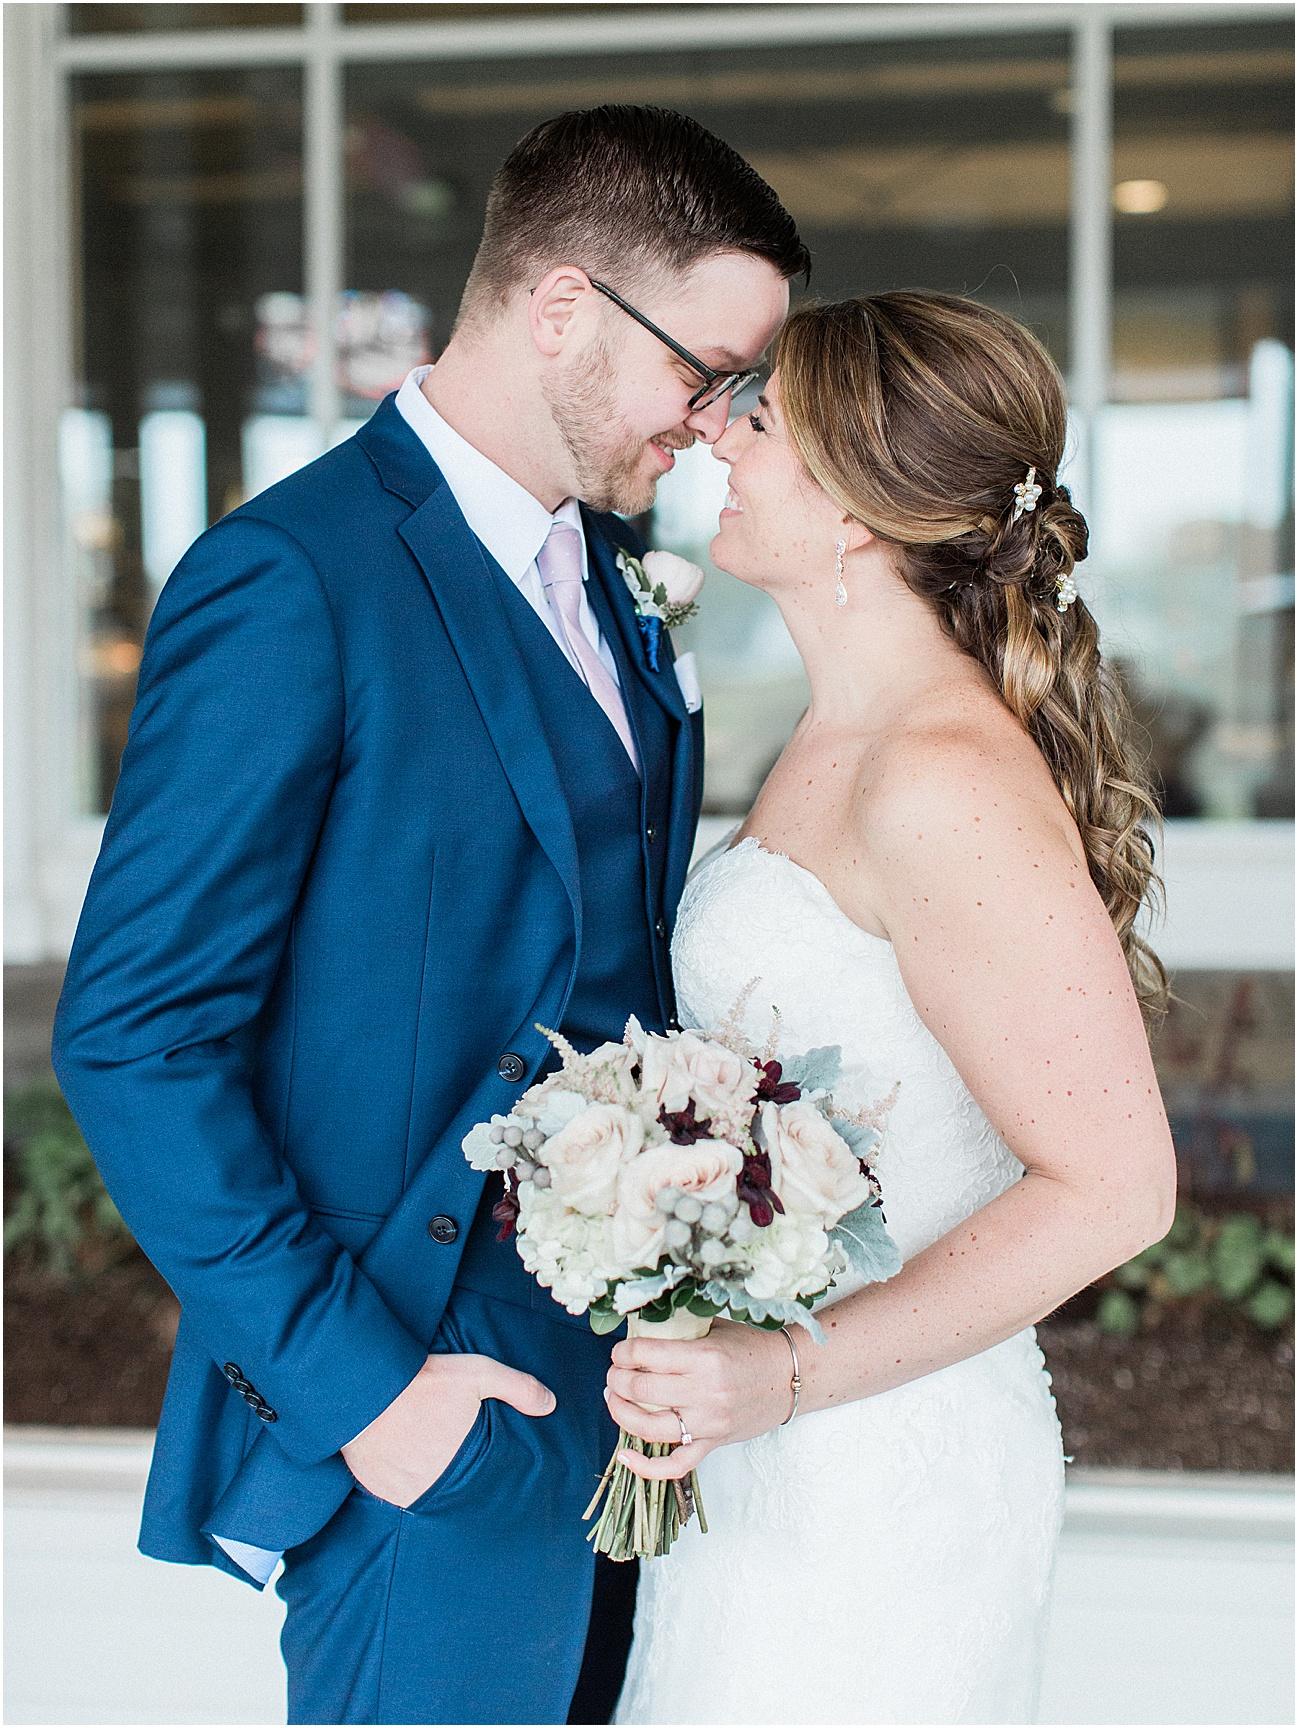 danielle_sean_willowbend_rain_rainy_day_cape_cod_boston_wedding_photographer_meredith_jane_photography_photo_1672.jpg